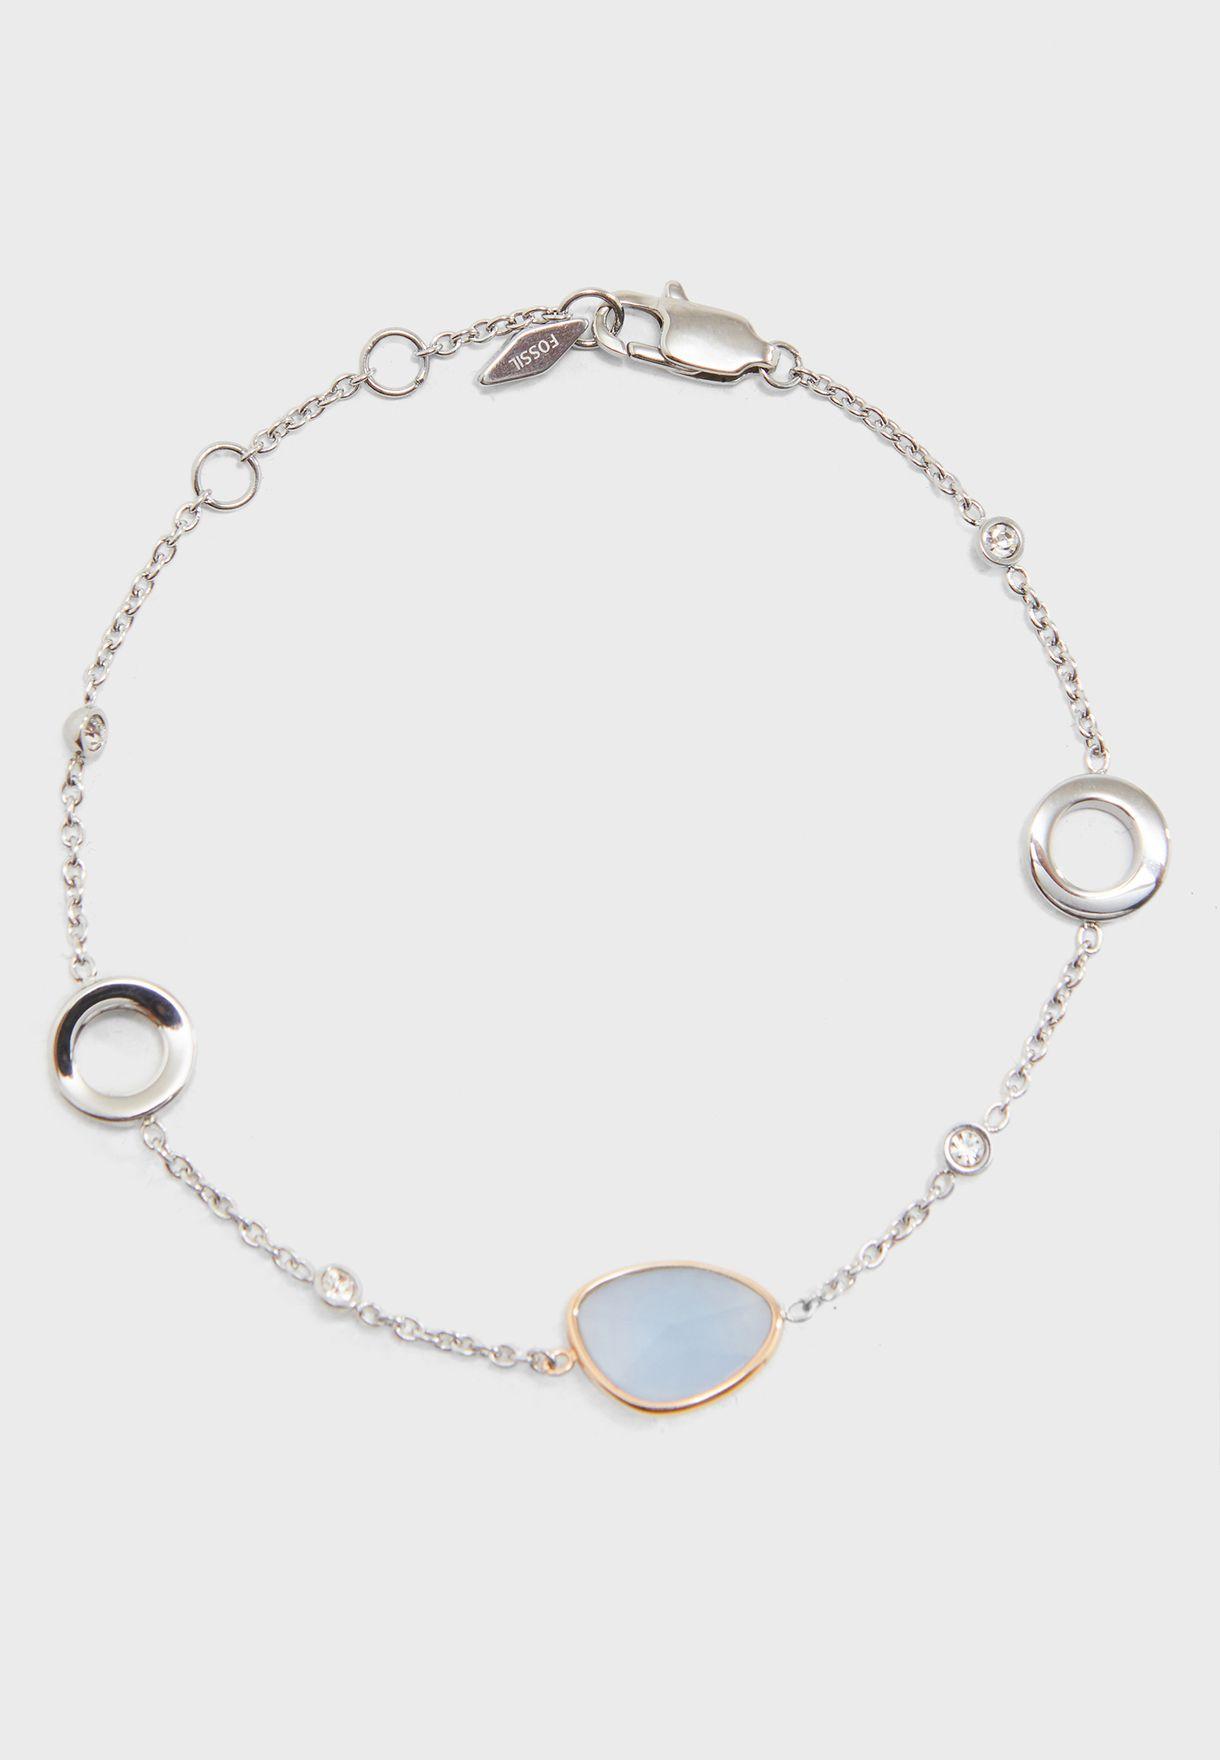 JF03075998 Vintage Iconic Bracelet